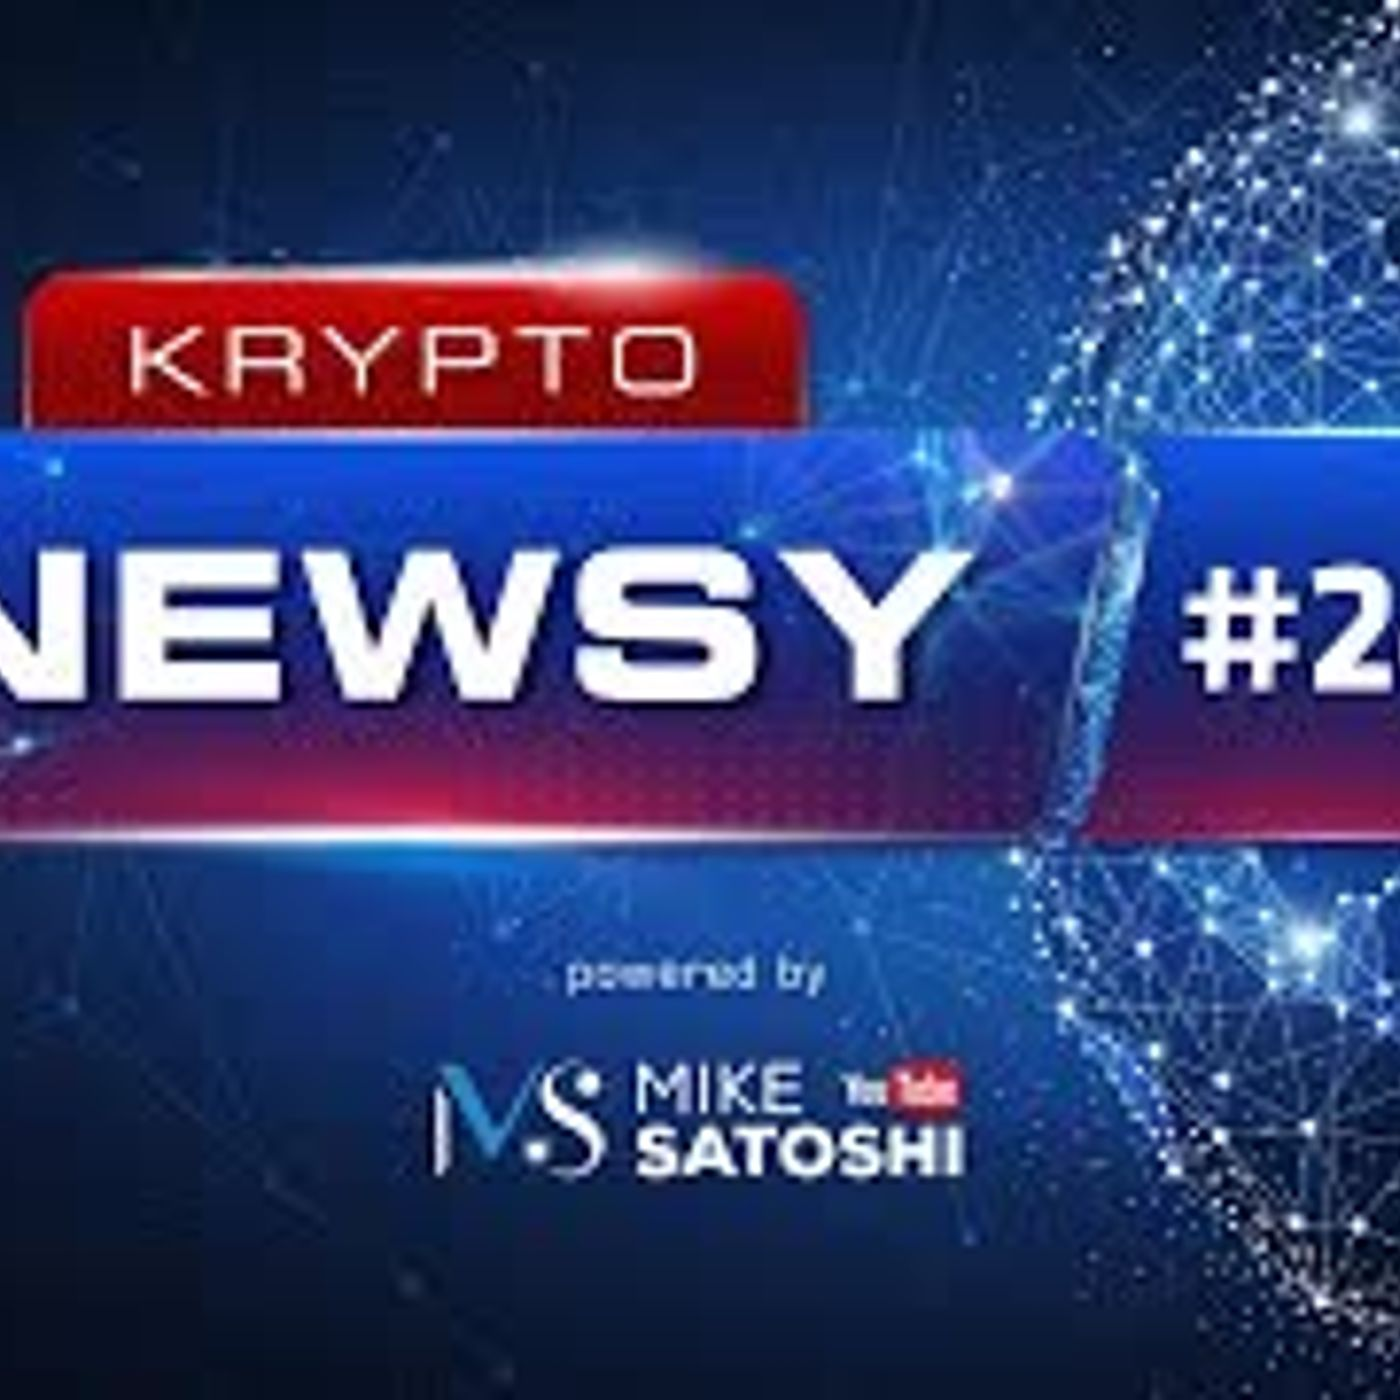 Krypto Newsy #247   21.11.2020   Pompa na XRP i altach! Bitcoin - atak na ATH czy korekta do $14k? Pompa na DeFi - Ethereum zapchane